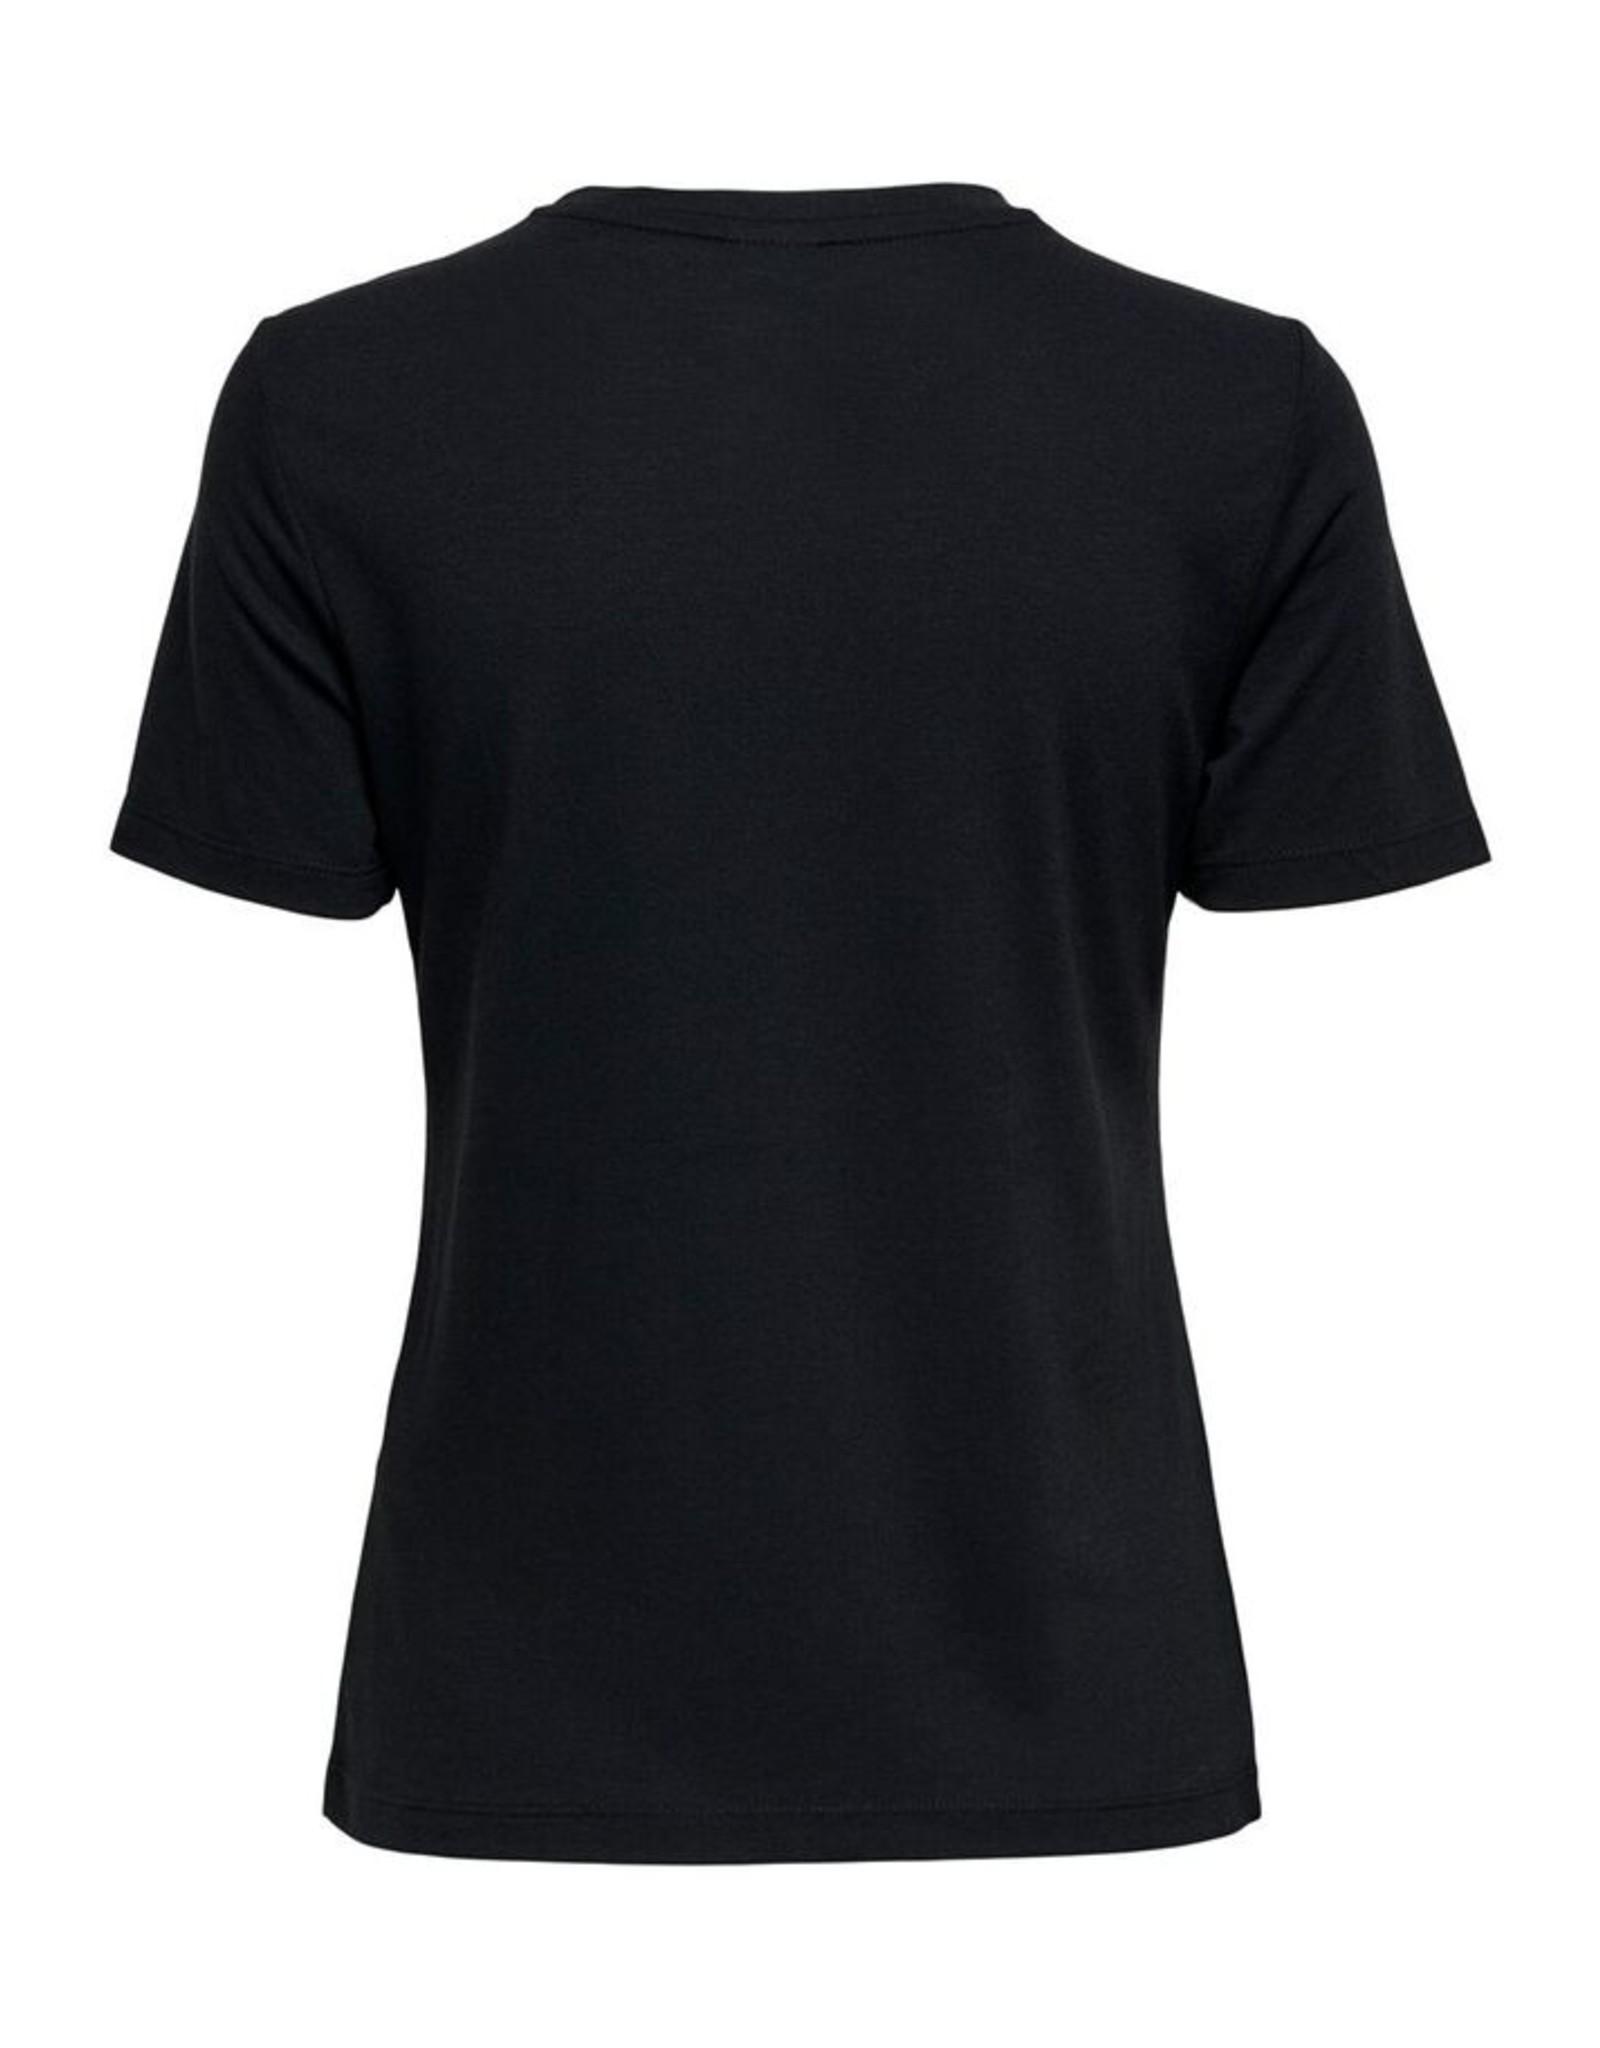 BUTTON T-SHIRT BLACK